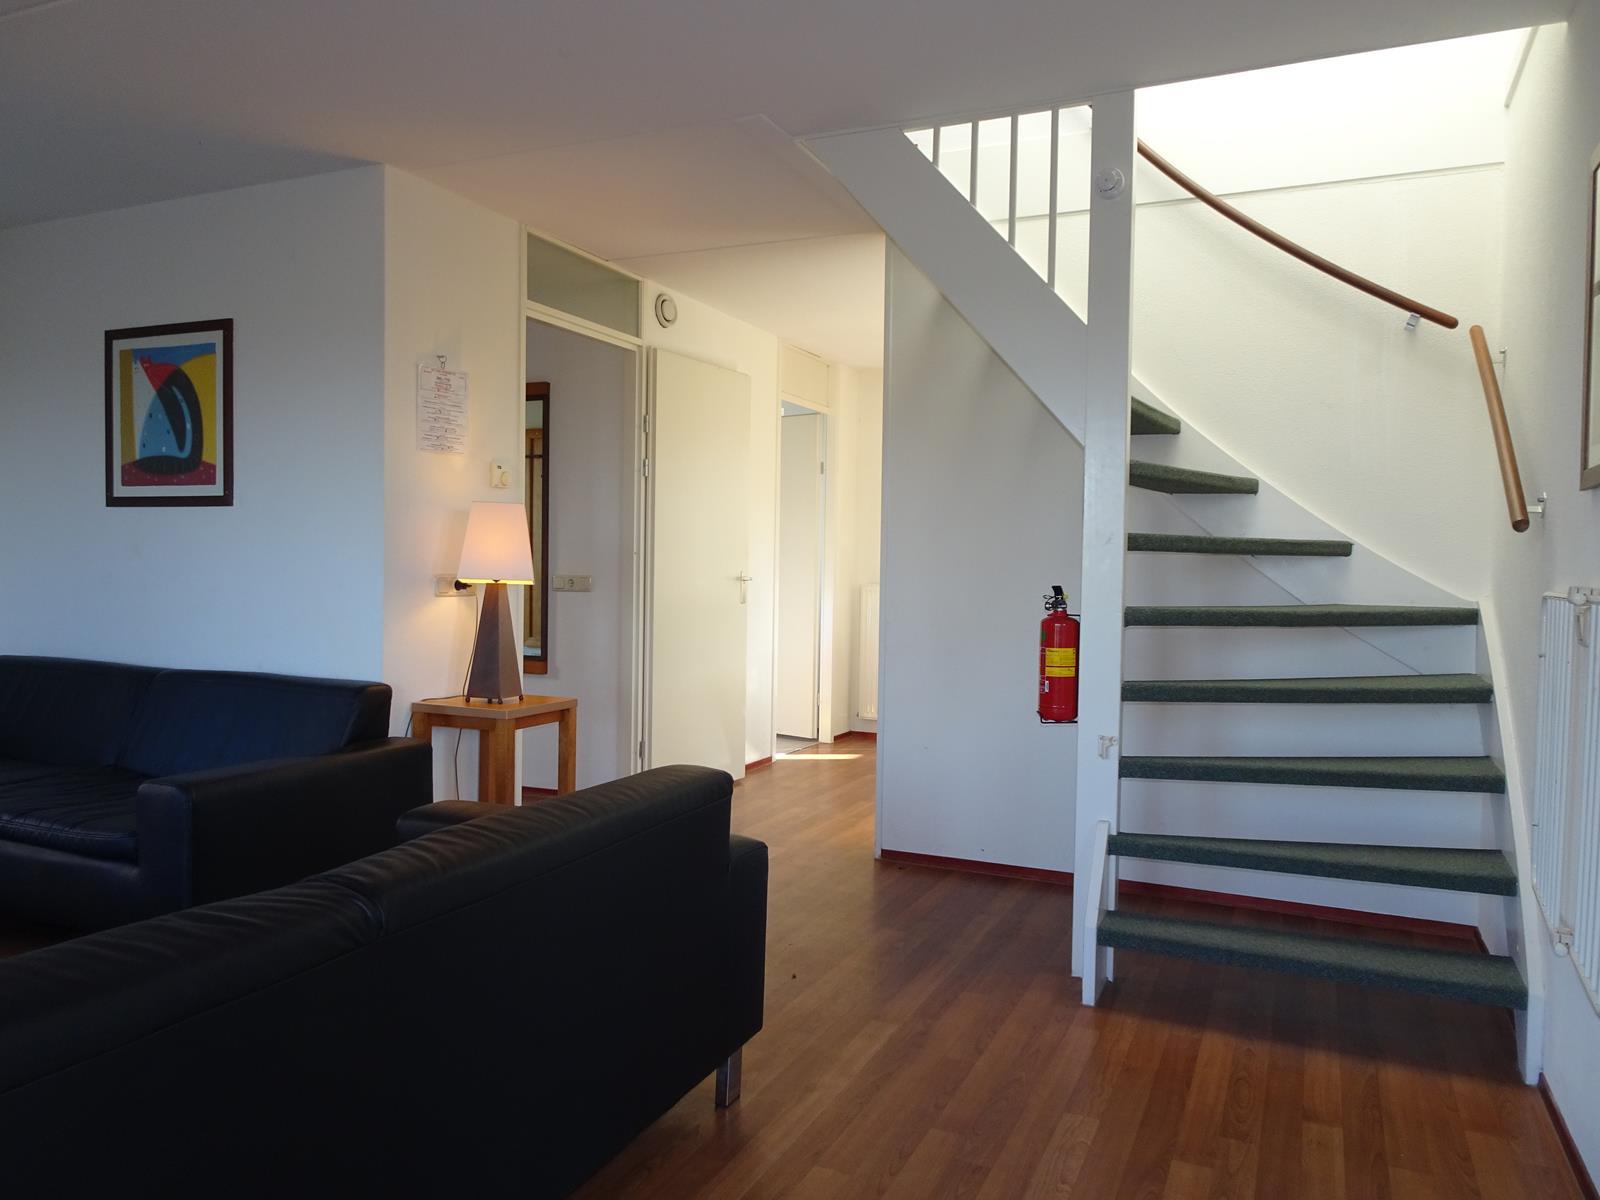 Vakantiehuis te koop Zeeland Bruinisse K155 (7).jpg